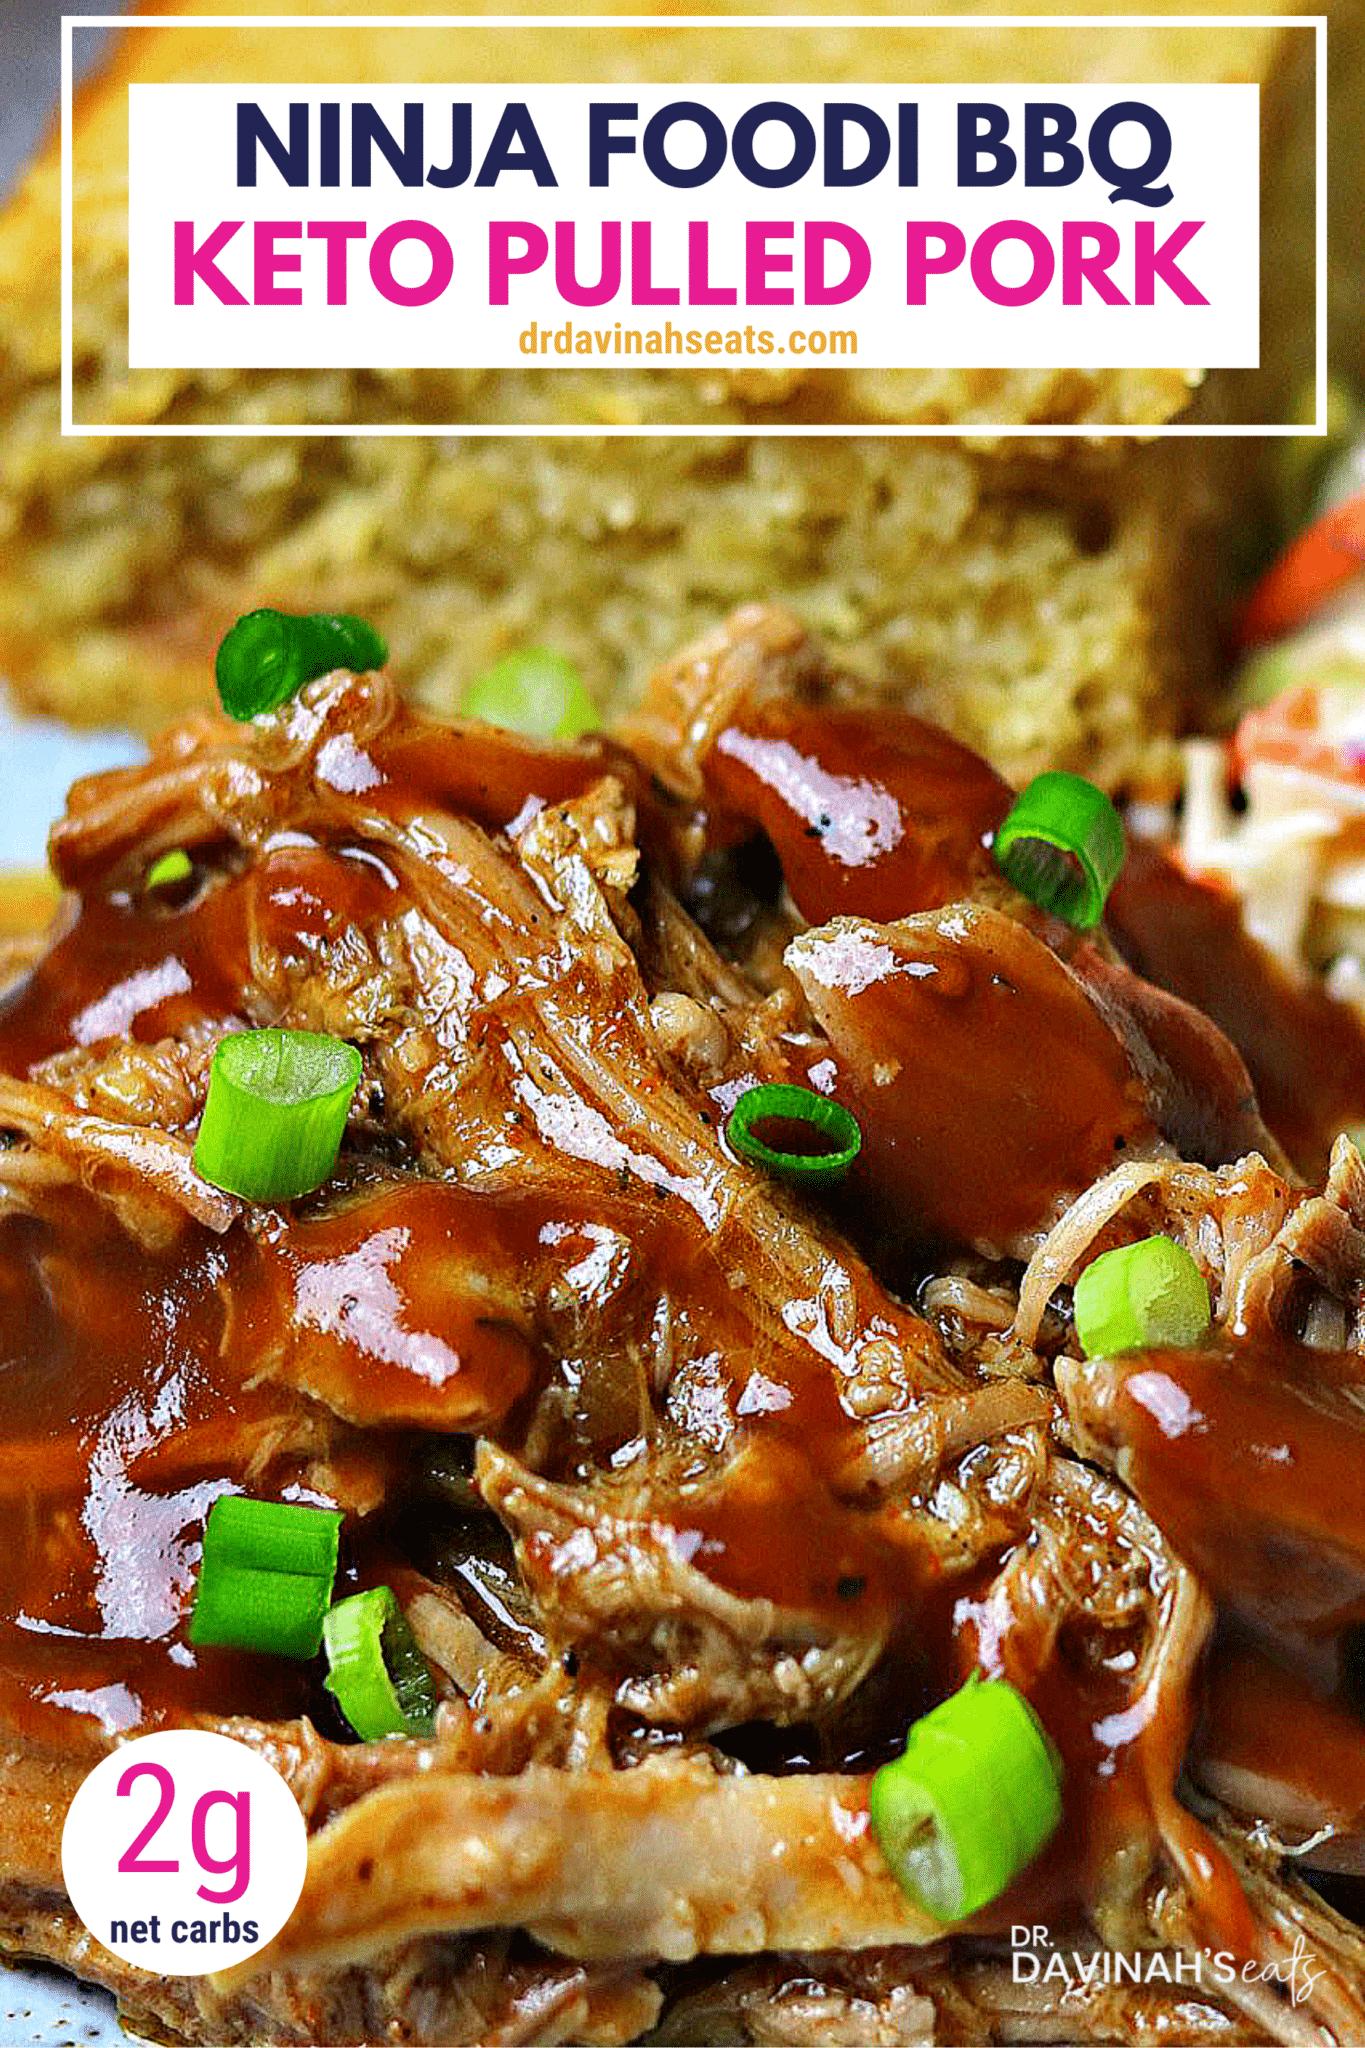 Pinterest image for keto BBQ pulled pork recipe